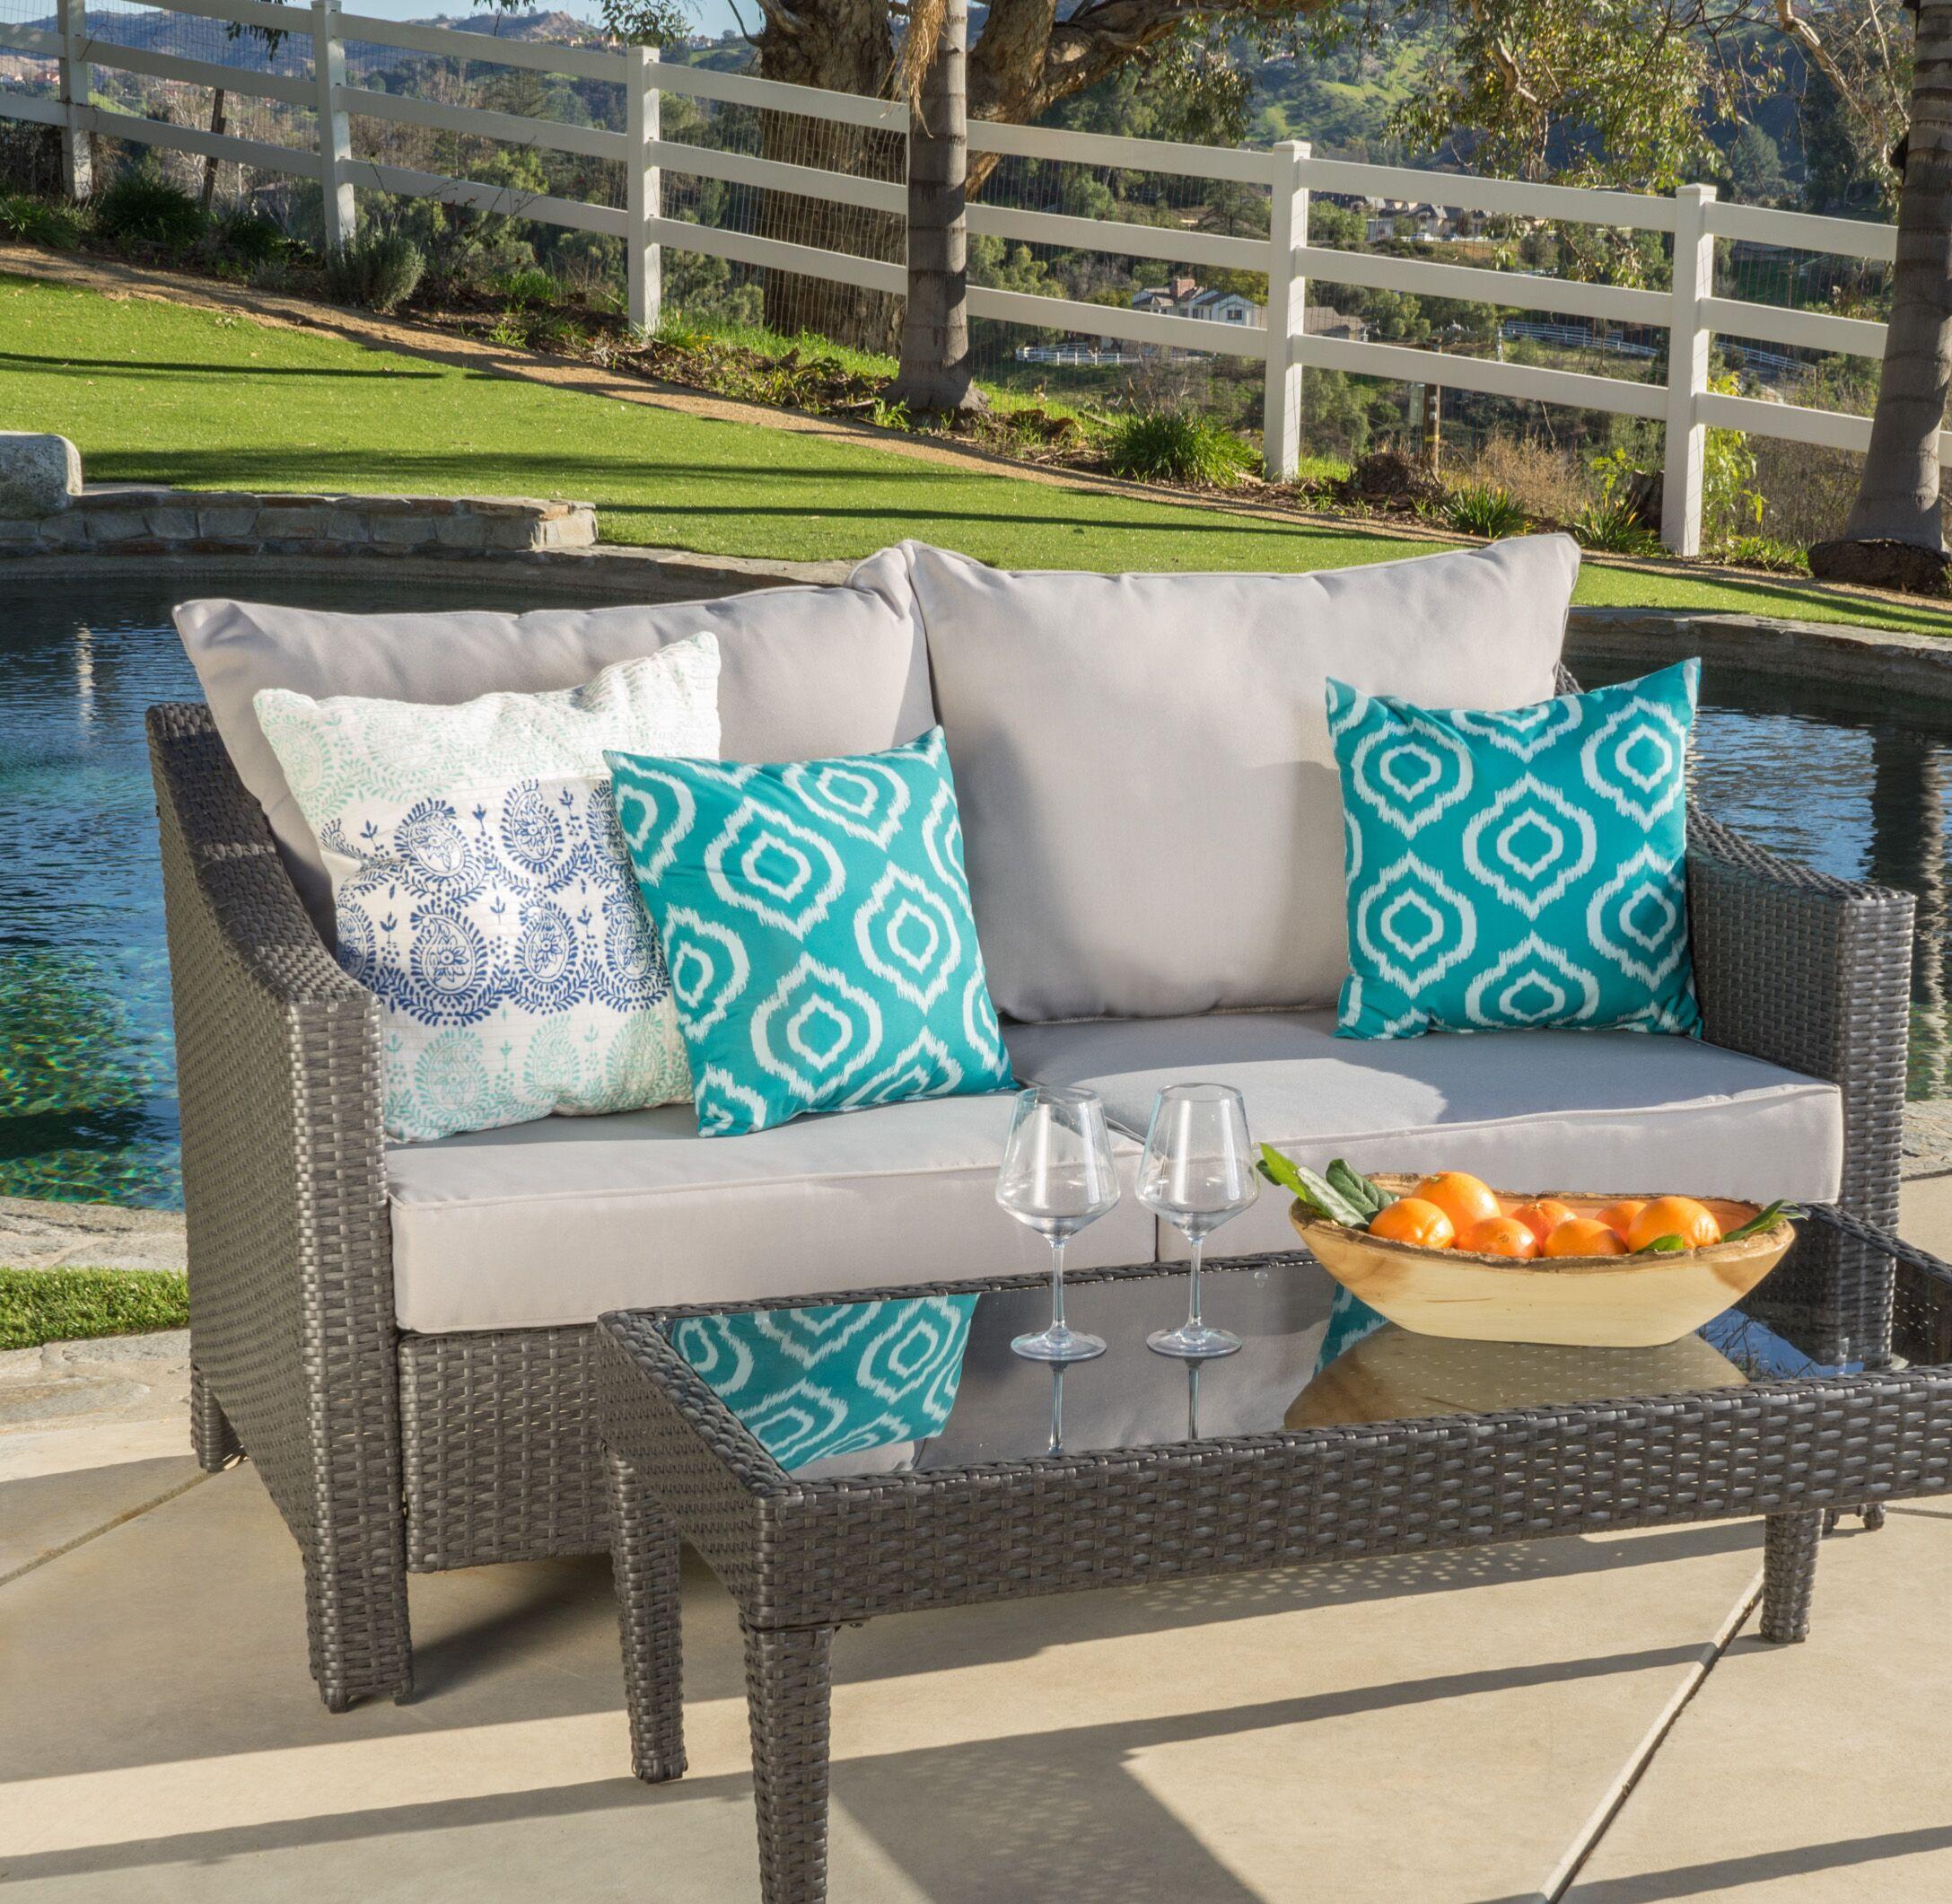 Harworth 2 Piece Rattan Sofa Set with Cushions Color: Gray